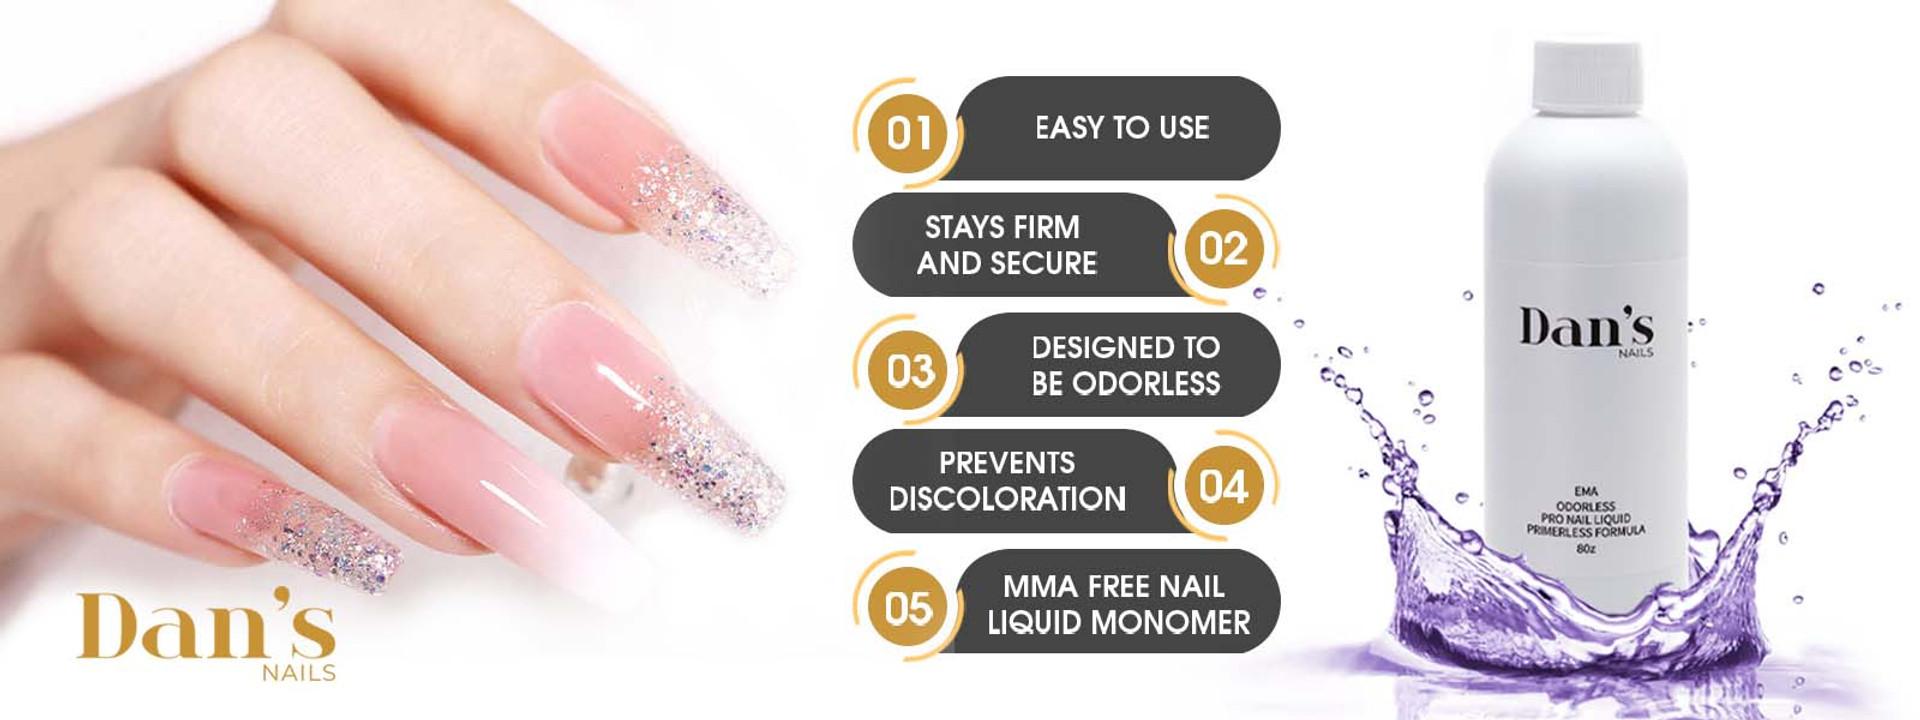 cheap nail supplies acrylic nail monomer liquid